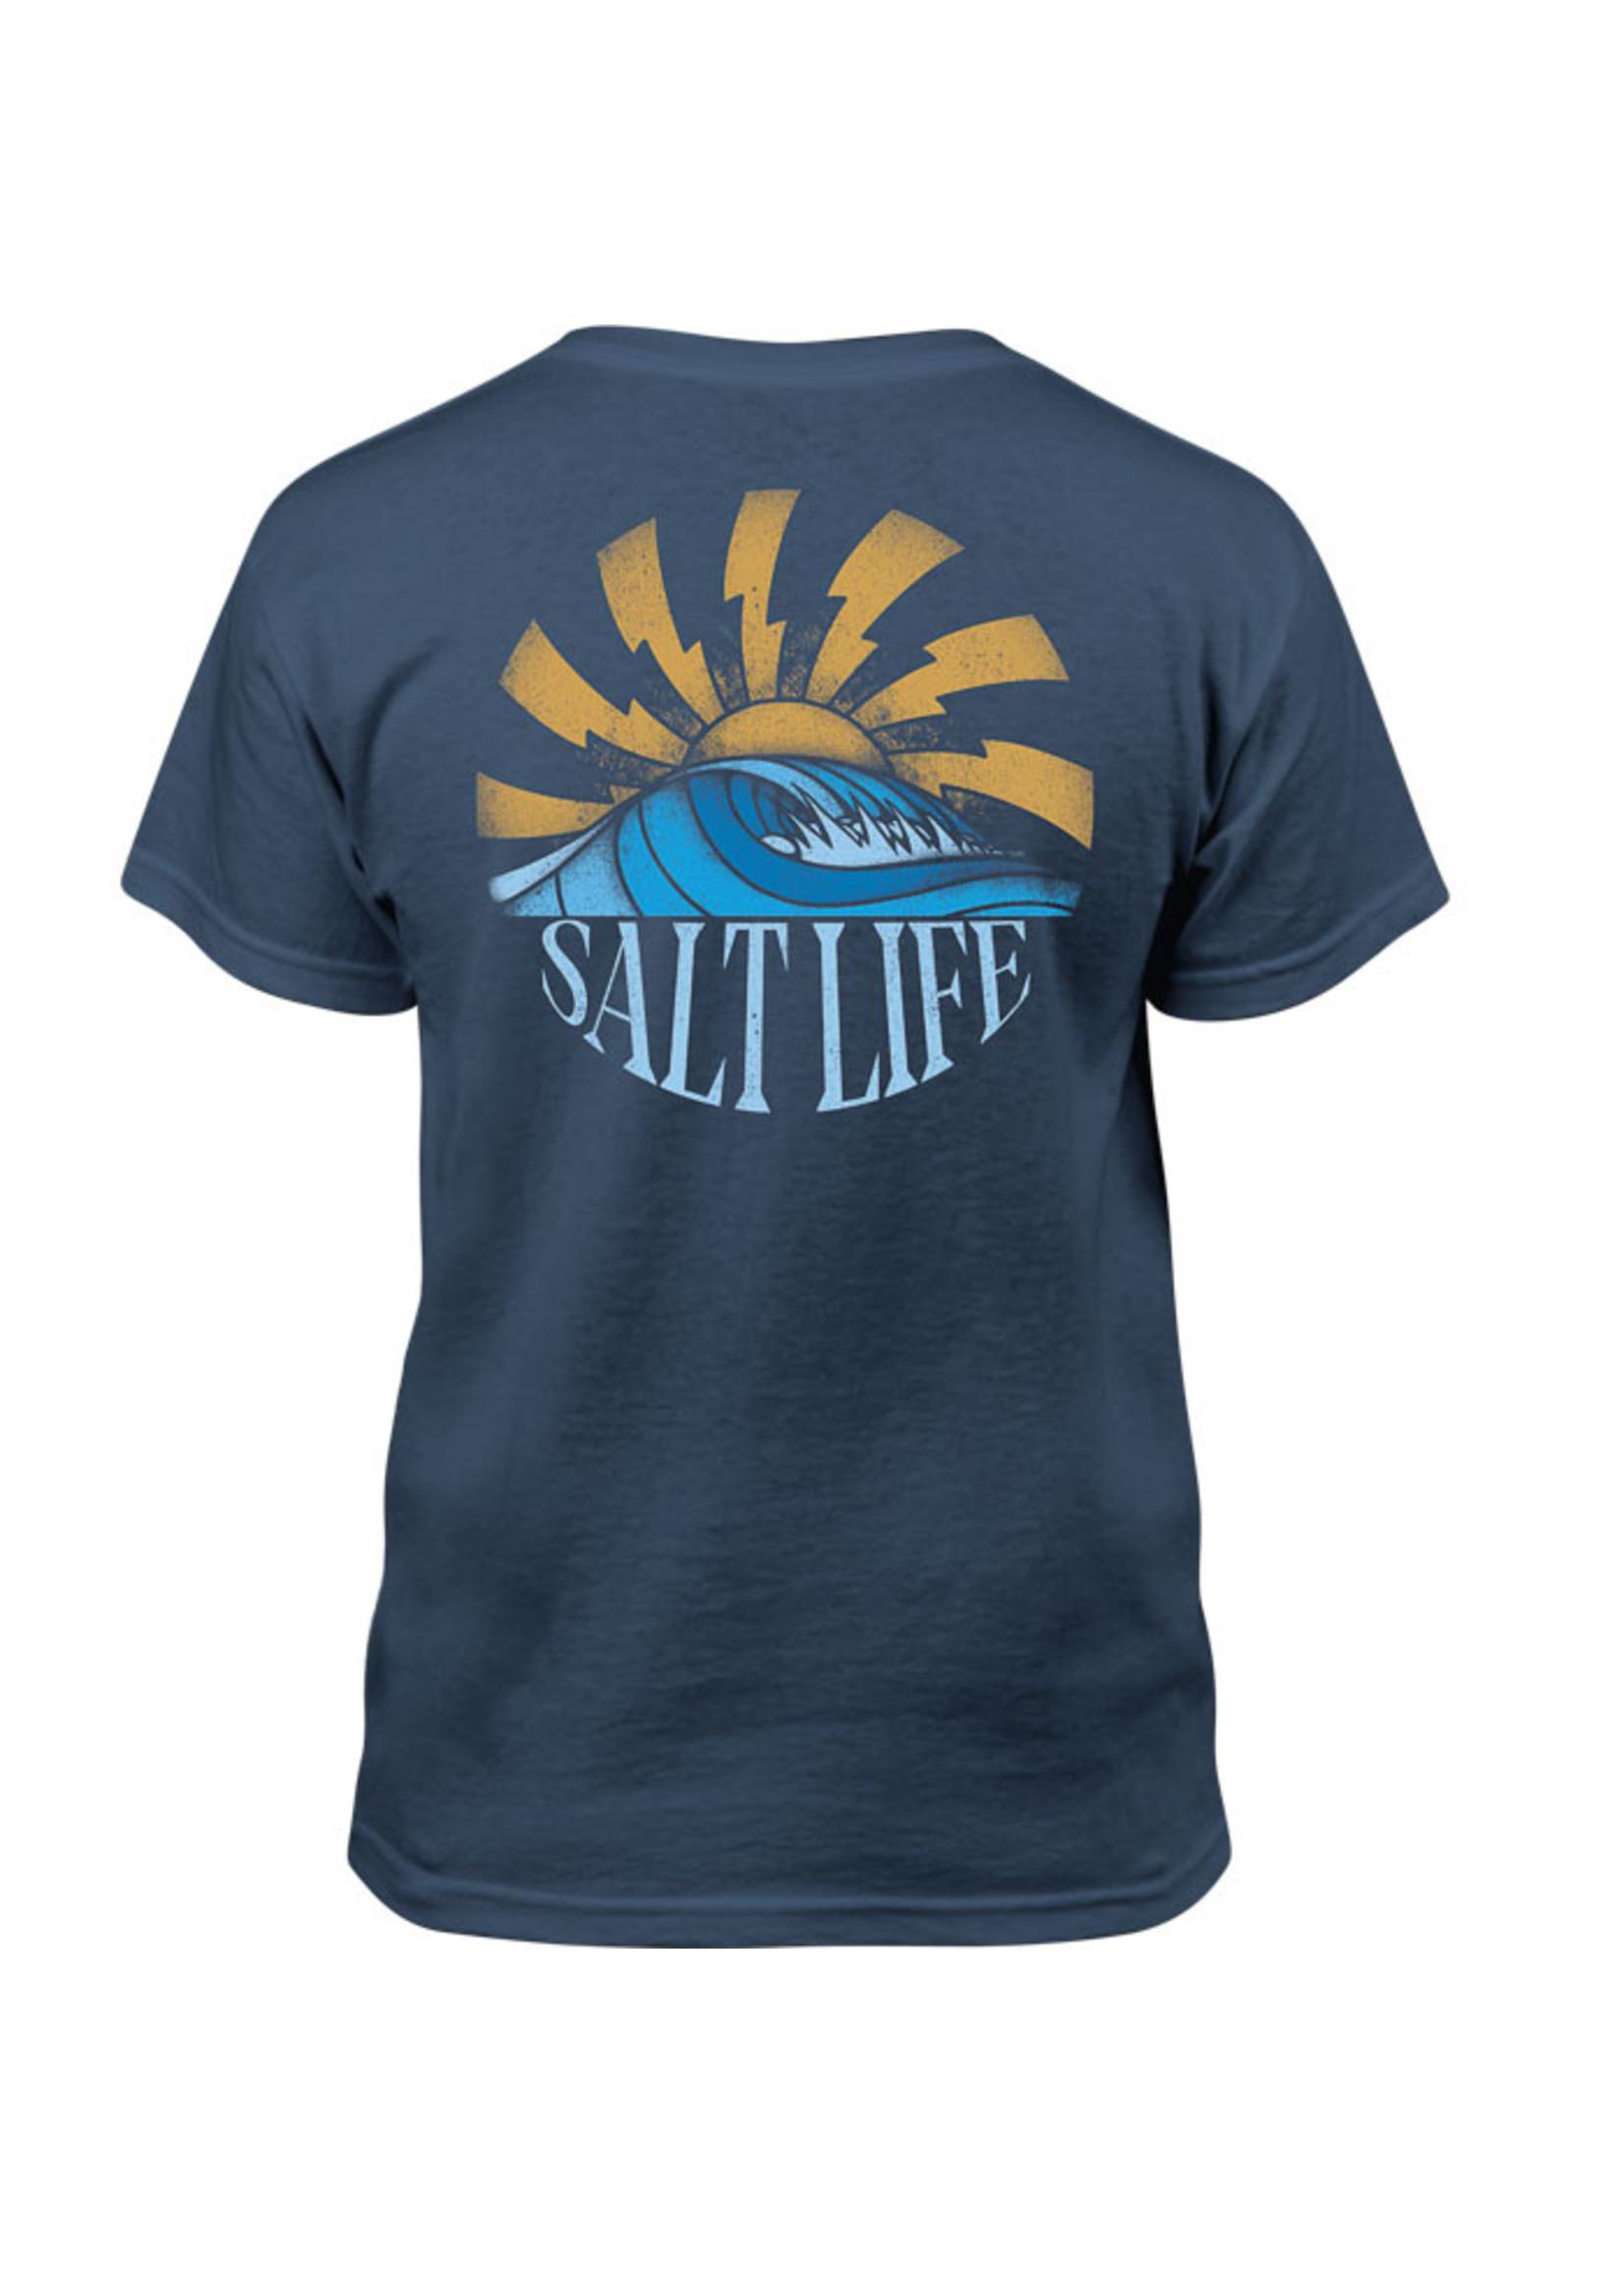 Salt Life Rising Sun Rays Youth Tee